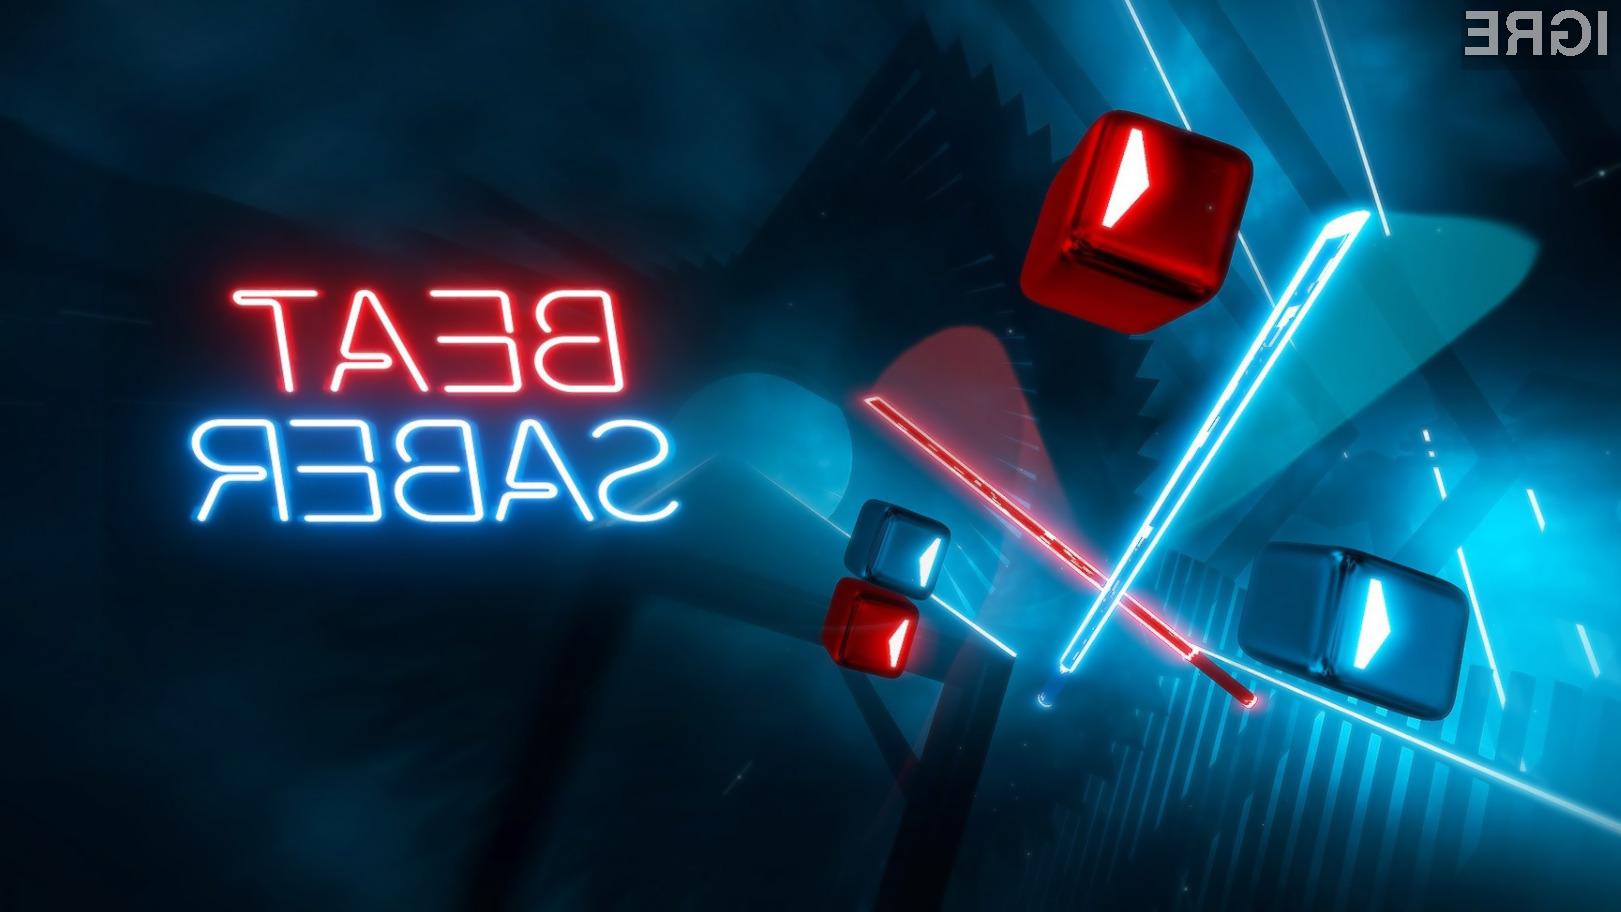 Beat Saber se je izkazal za ogromno uspešnico mlade češke ekipe.